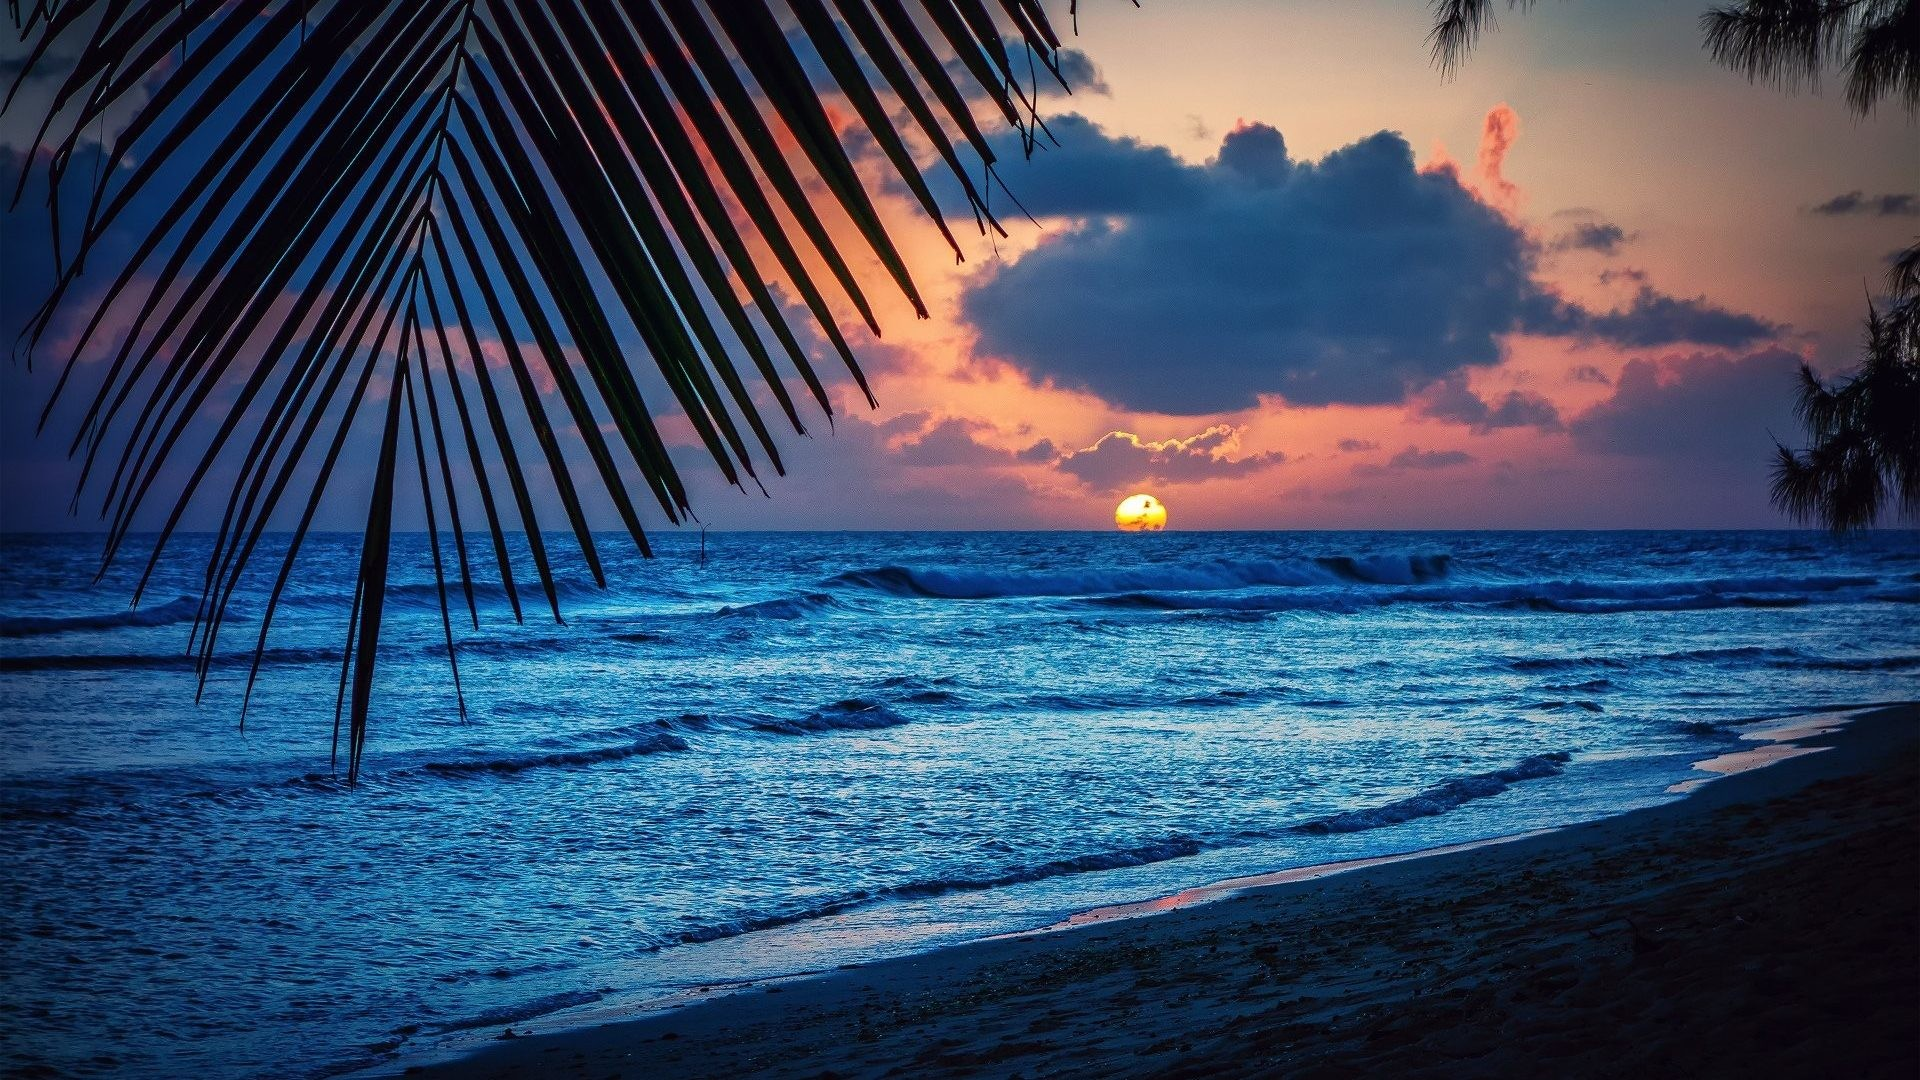 Caribbean wallpaper widescreen 61 images - Caribbean wallpaper free ...